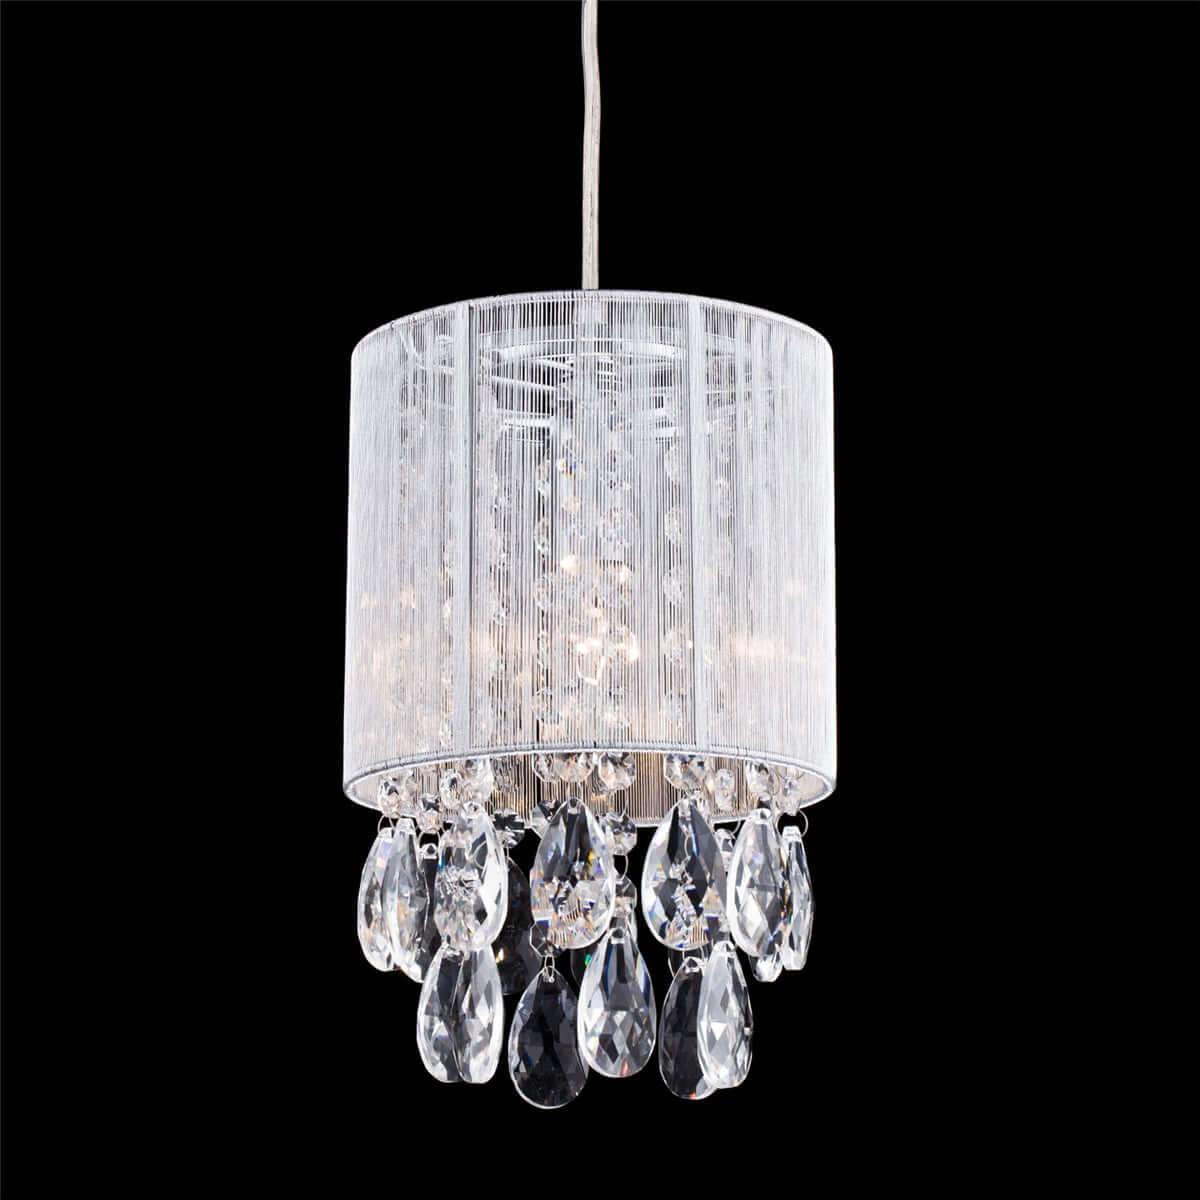 Modern-Silver-String-Drum-Shade-Crystal-Pendant-Lighting